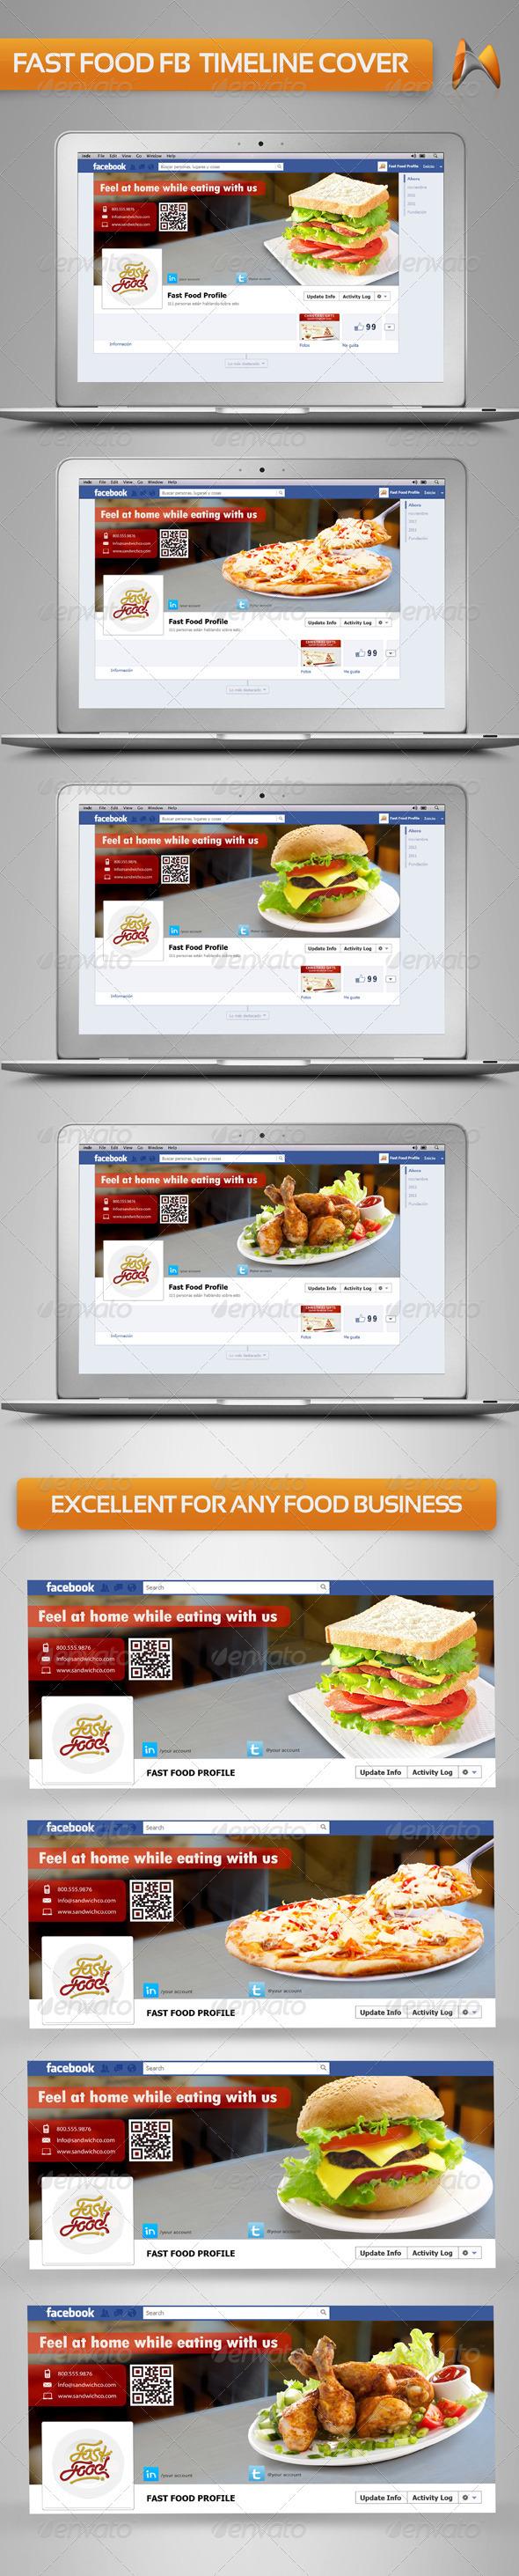 Multi Fast Food FB Timeline Cover - Facebook Timeline Covers Social Media